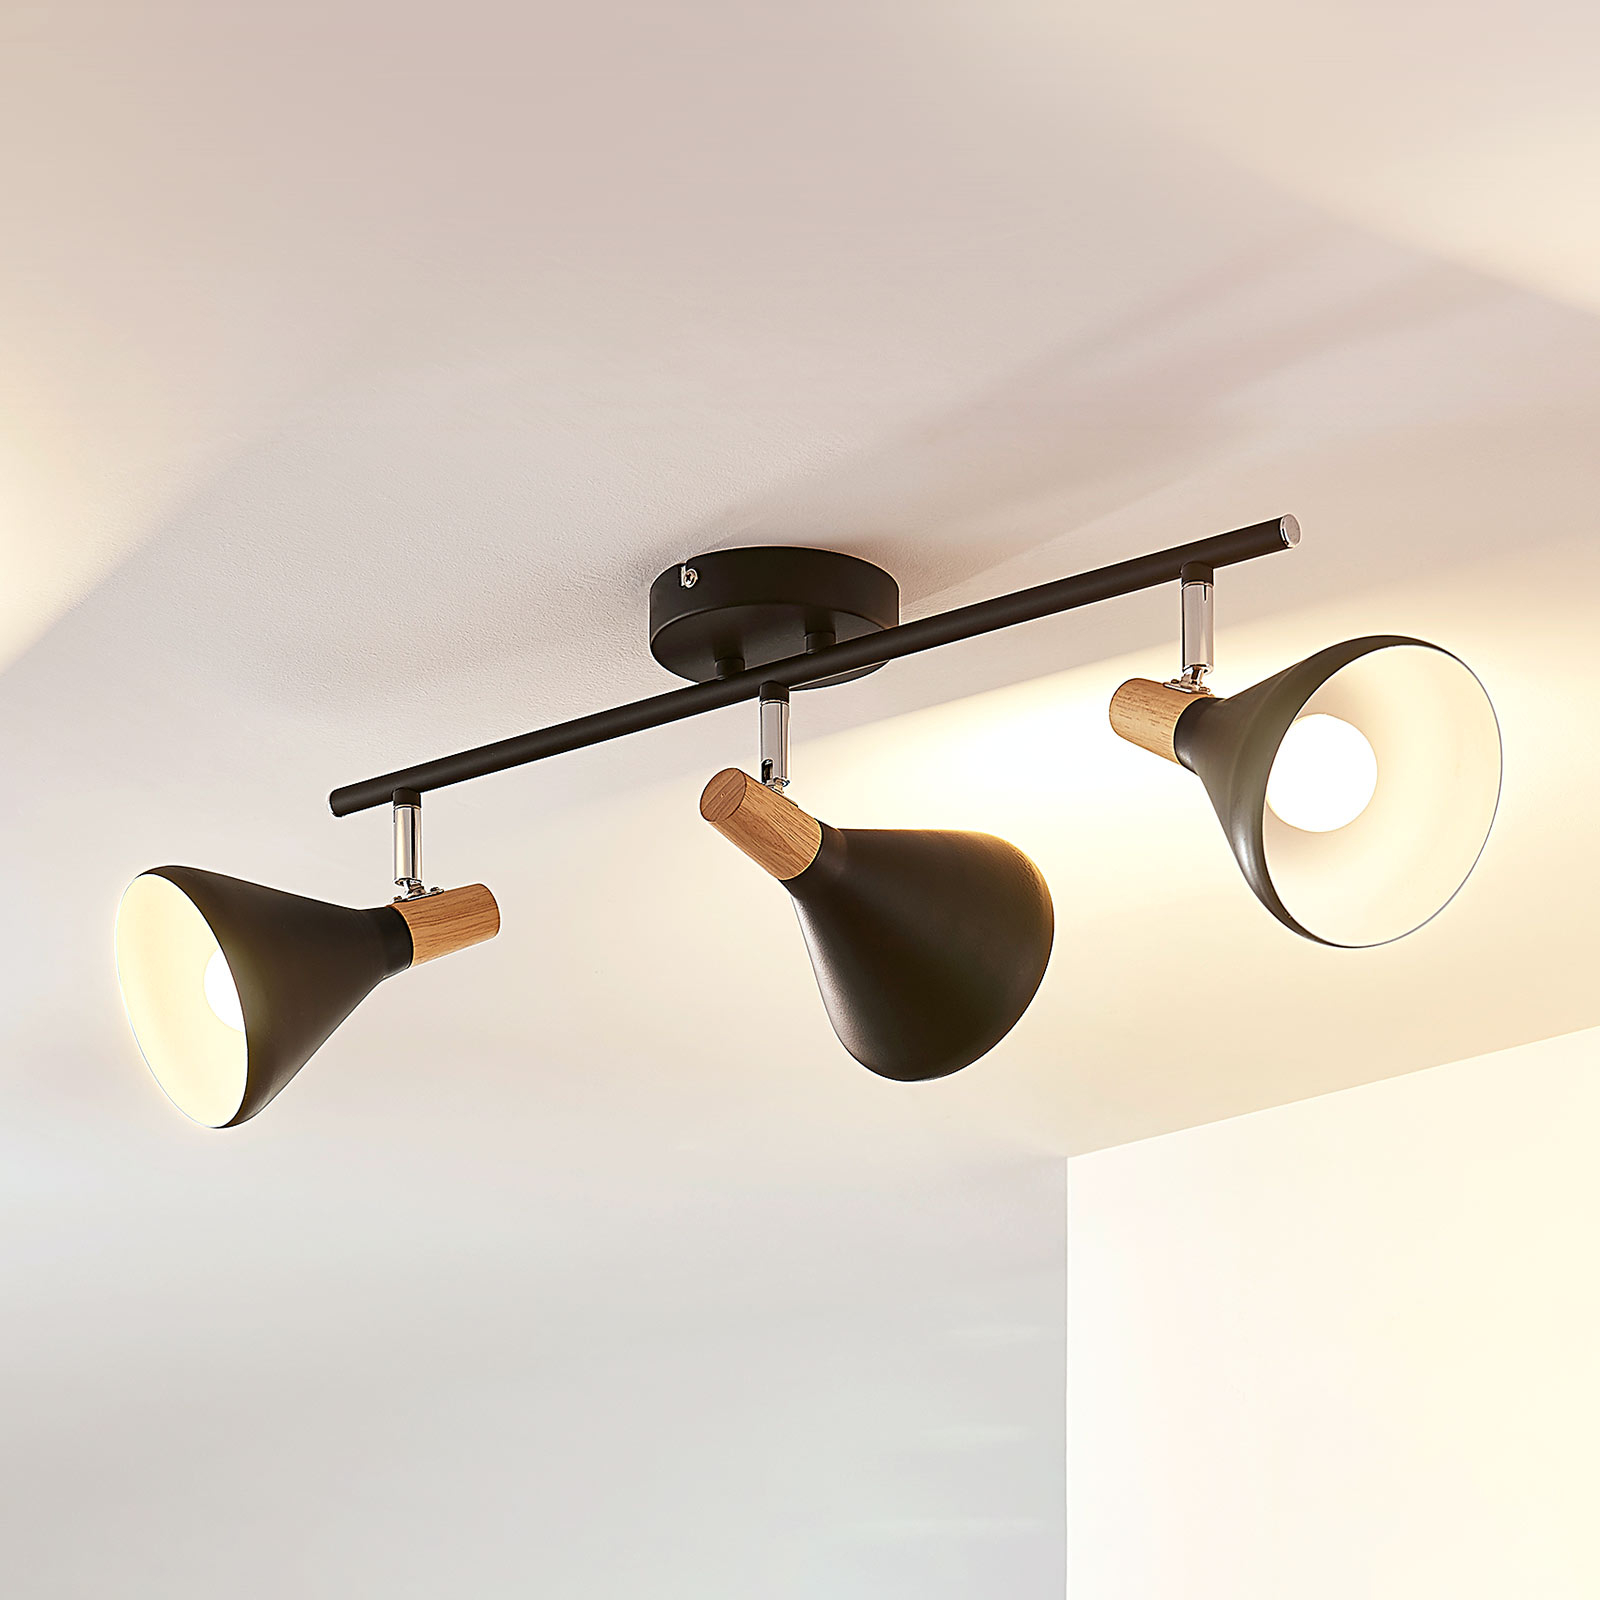 Lampa sufitowa LED Arina w stylu skandynawskim